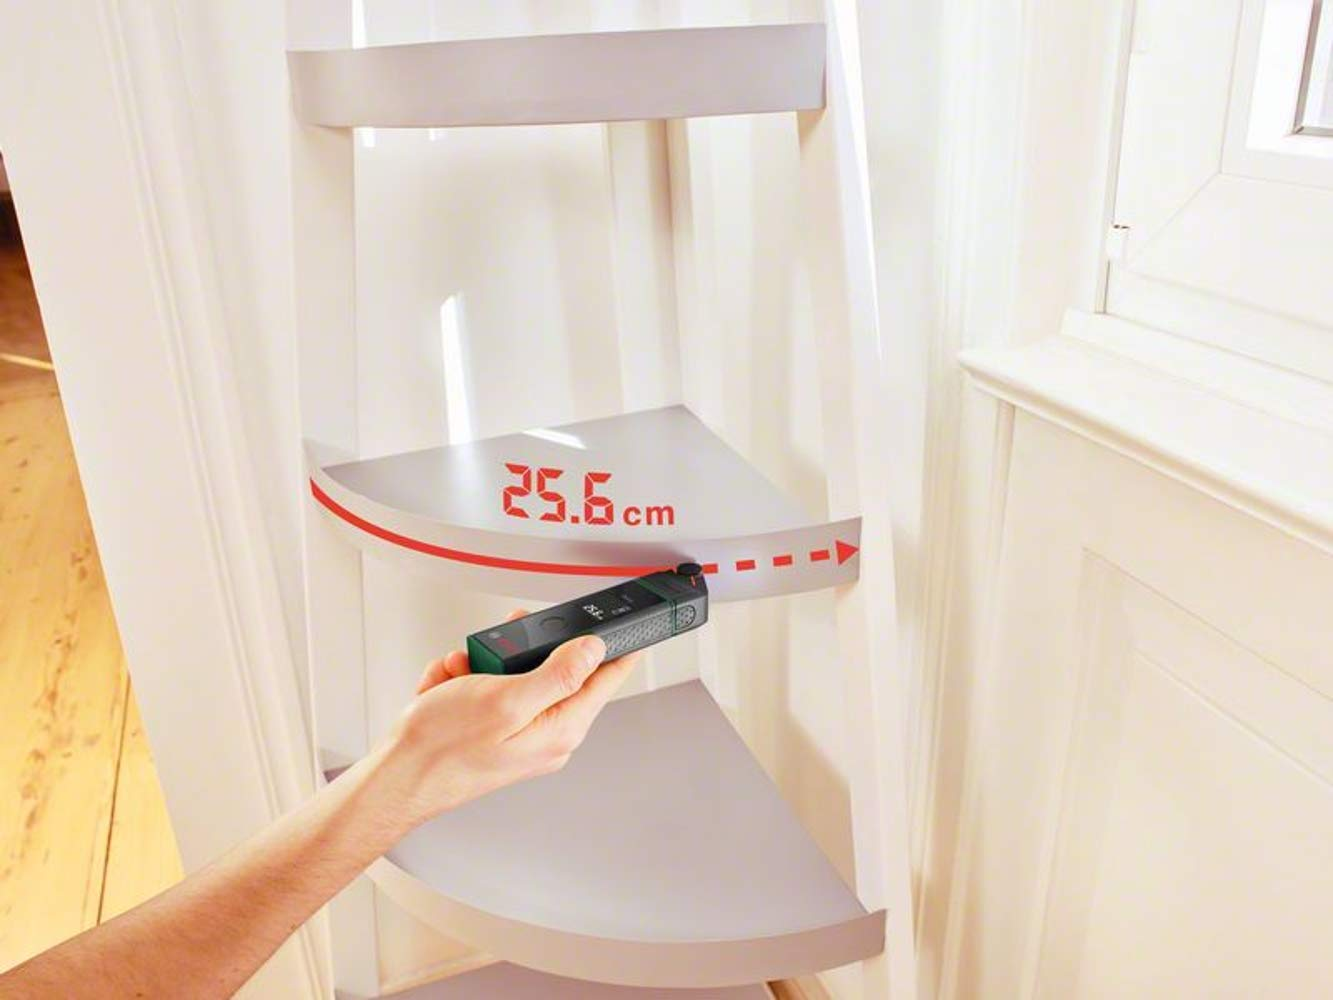 Laser Entfernungsmesser Zamo : Bosch zamo set gen laser entfernungsmesser nagelneu in